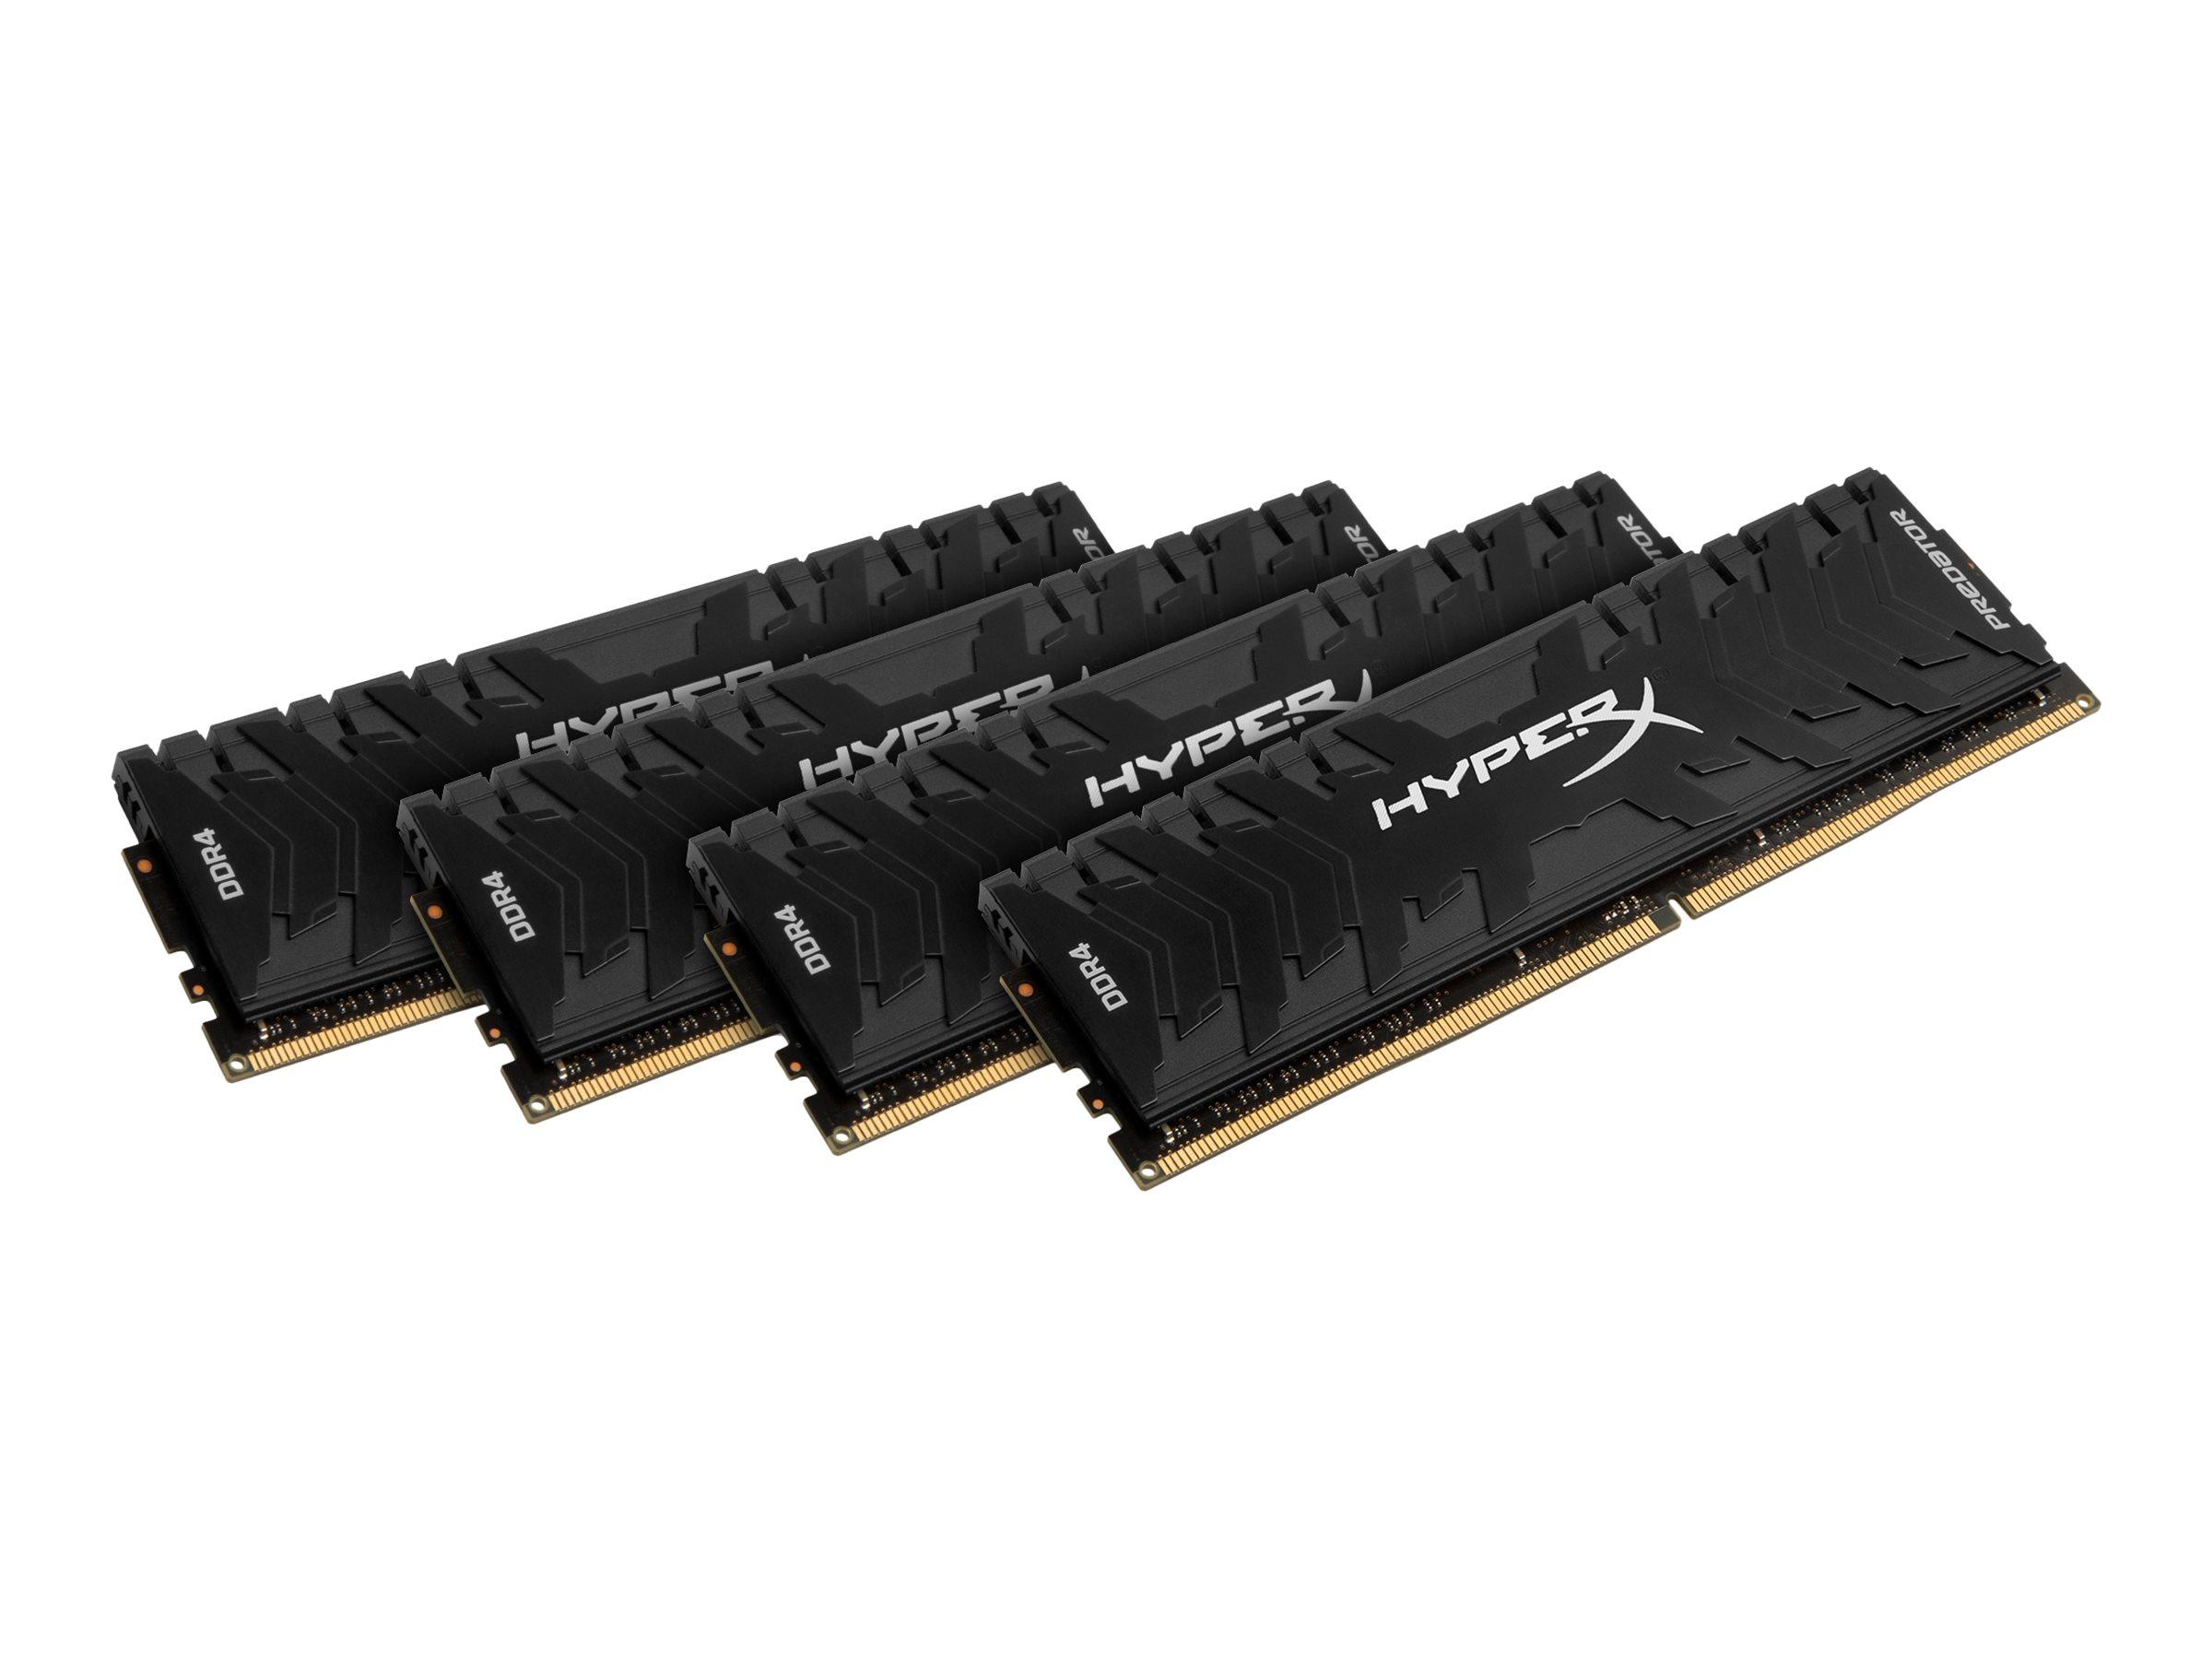 HyperX Predator - DDR4 - 32 GB: 4 x 8 GB - DIMM 288-PIN - 3333 MHz / PC4-26600 - CL16